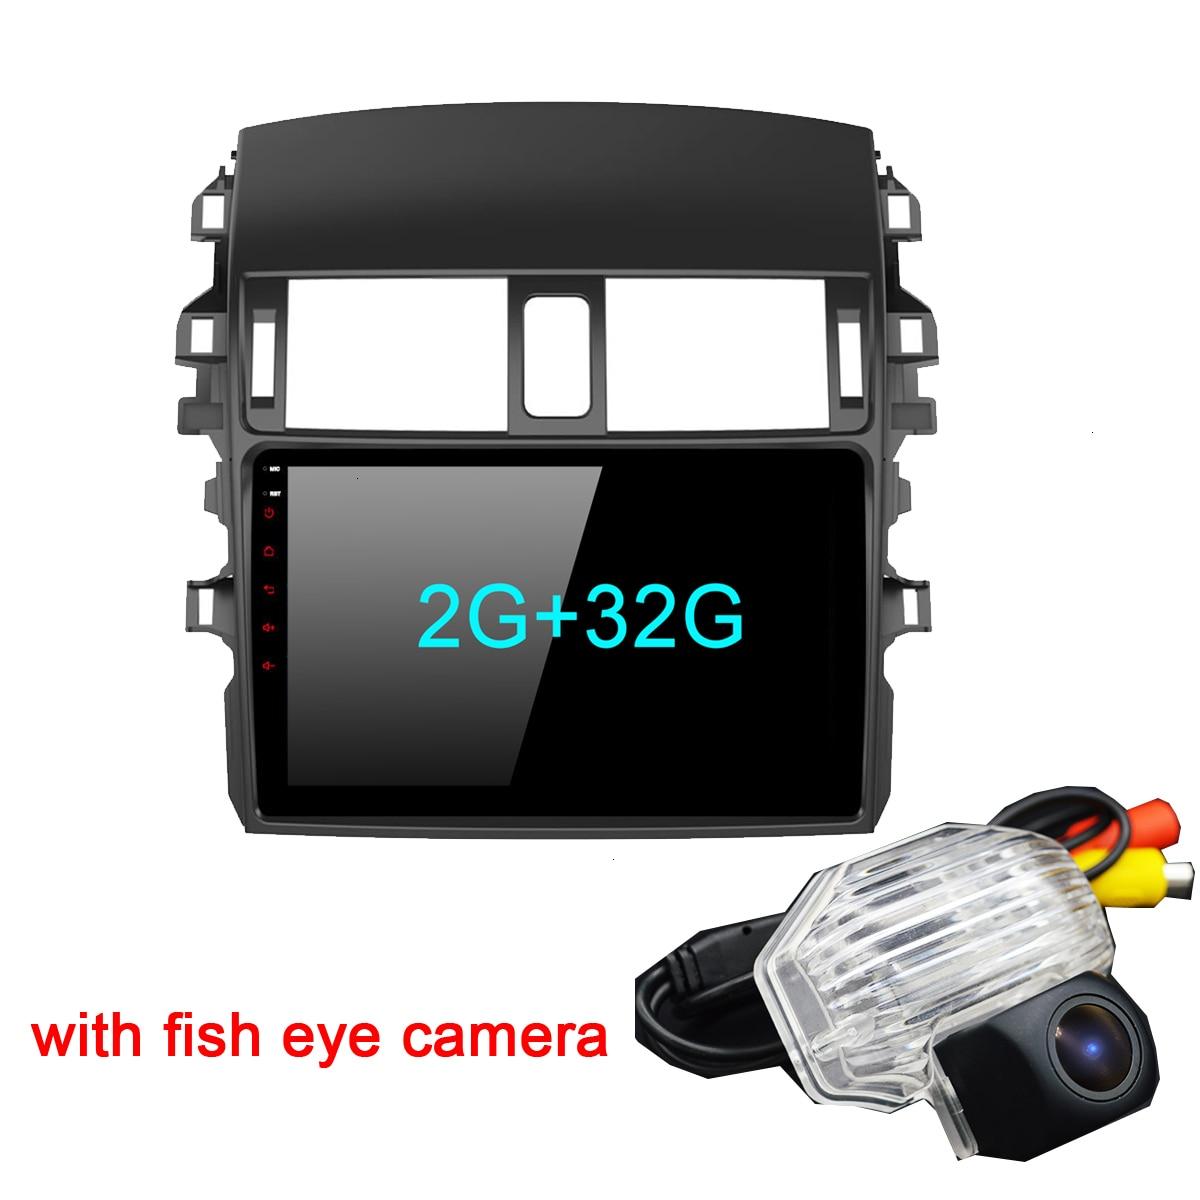 Android 9,0 Auto Radio Multimedia-Player Für Toyota Corolla E140/150 2008 2009 2010 2011 2012 2013 Stereo GPS navigation 2 din PC